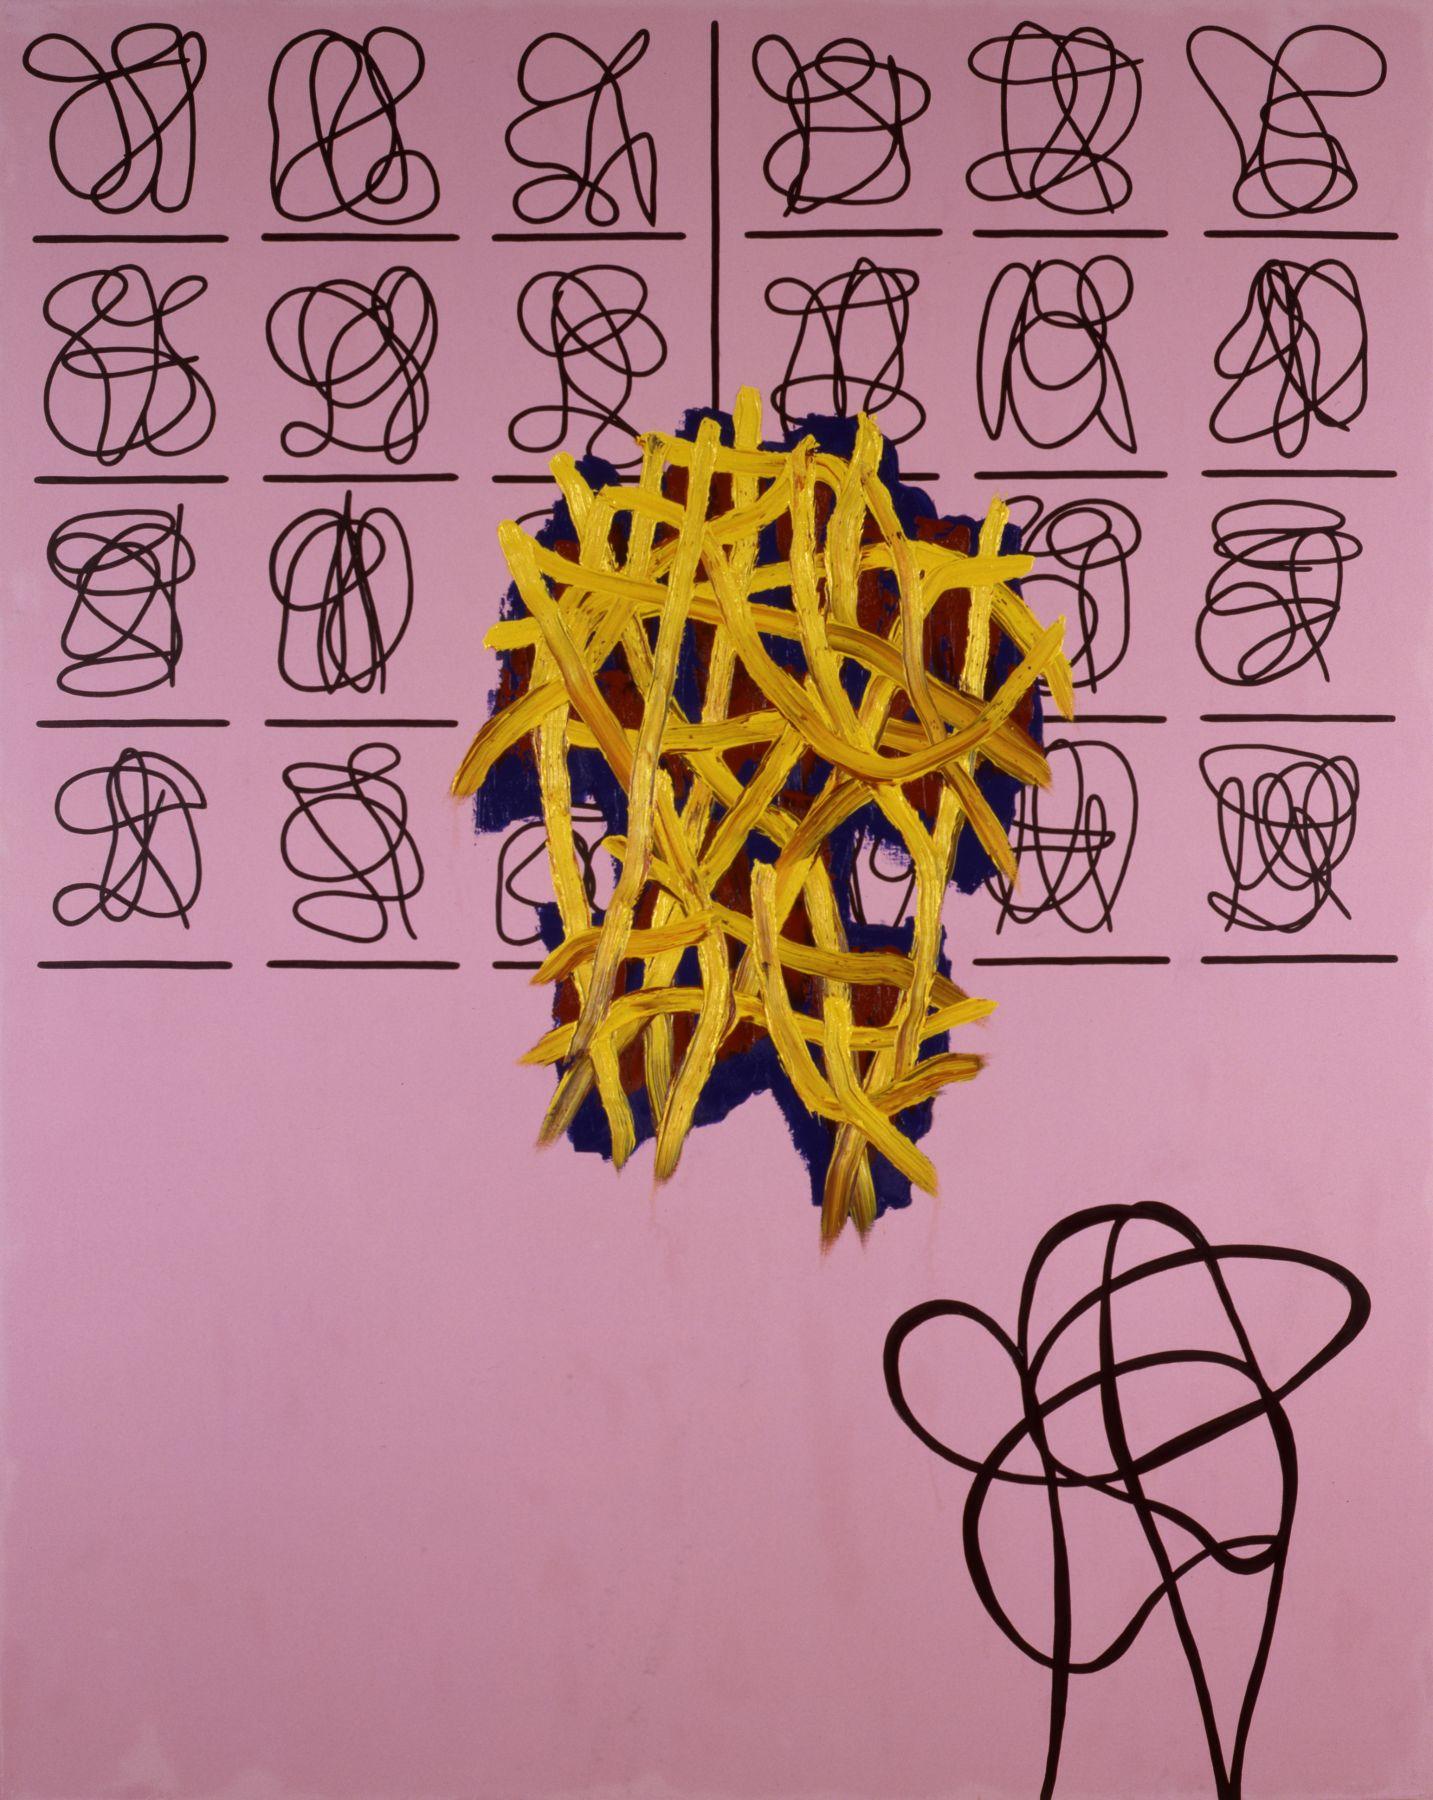 Jonathan Lasker Spiritual Etiquette,1991